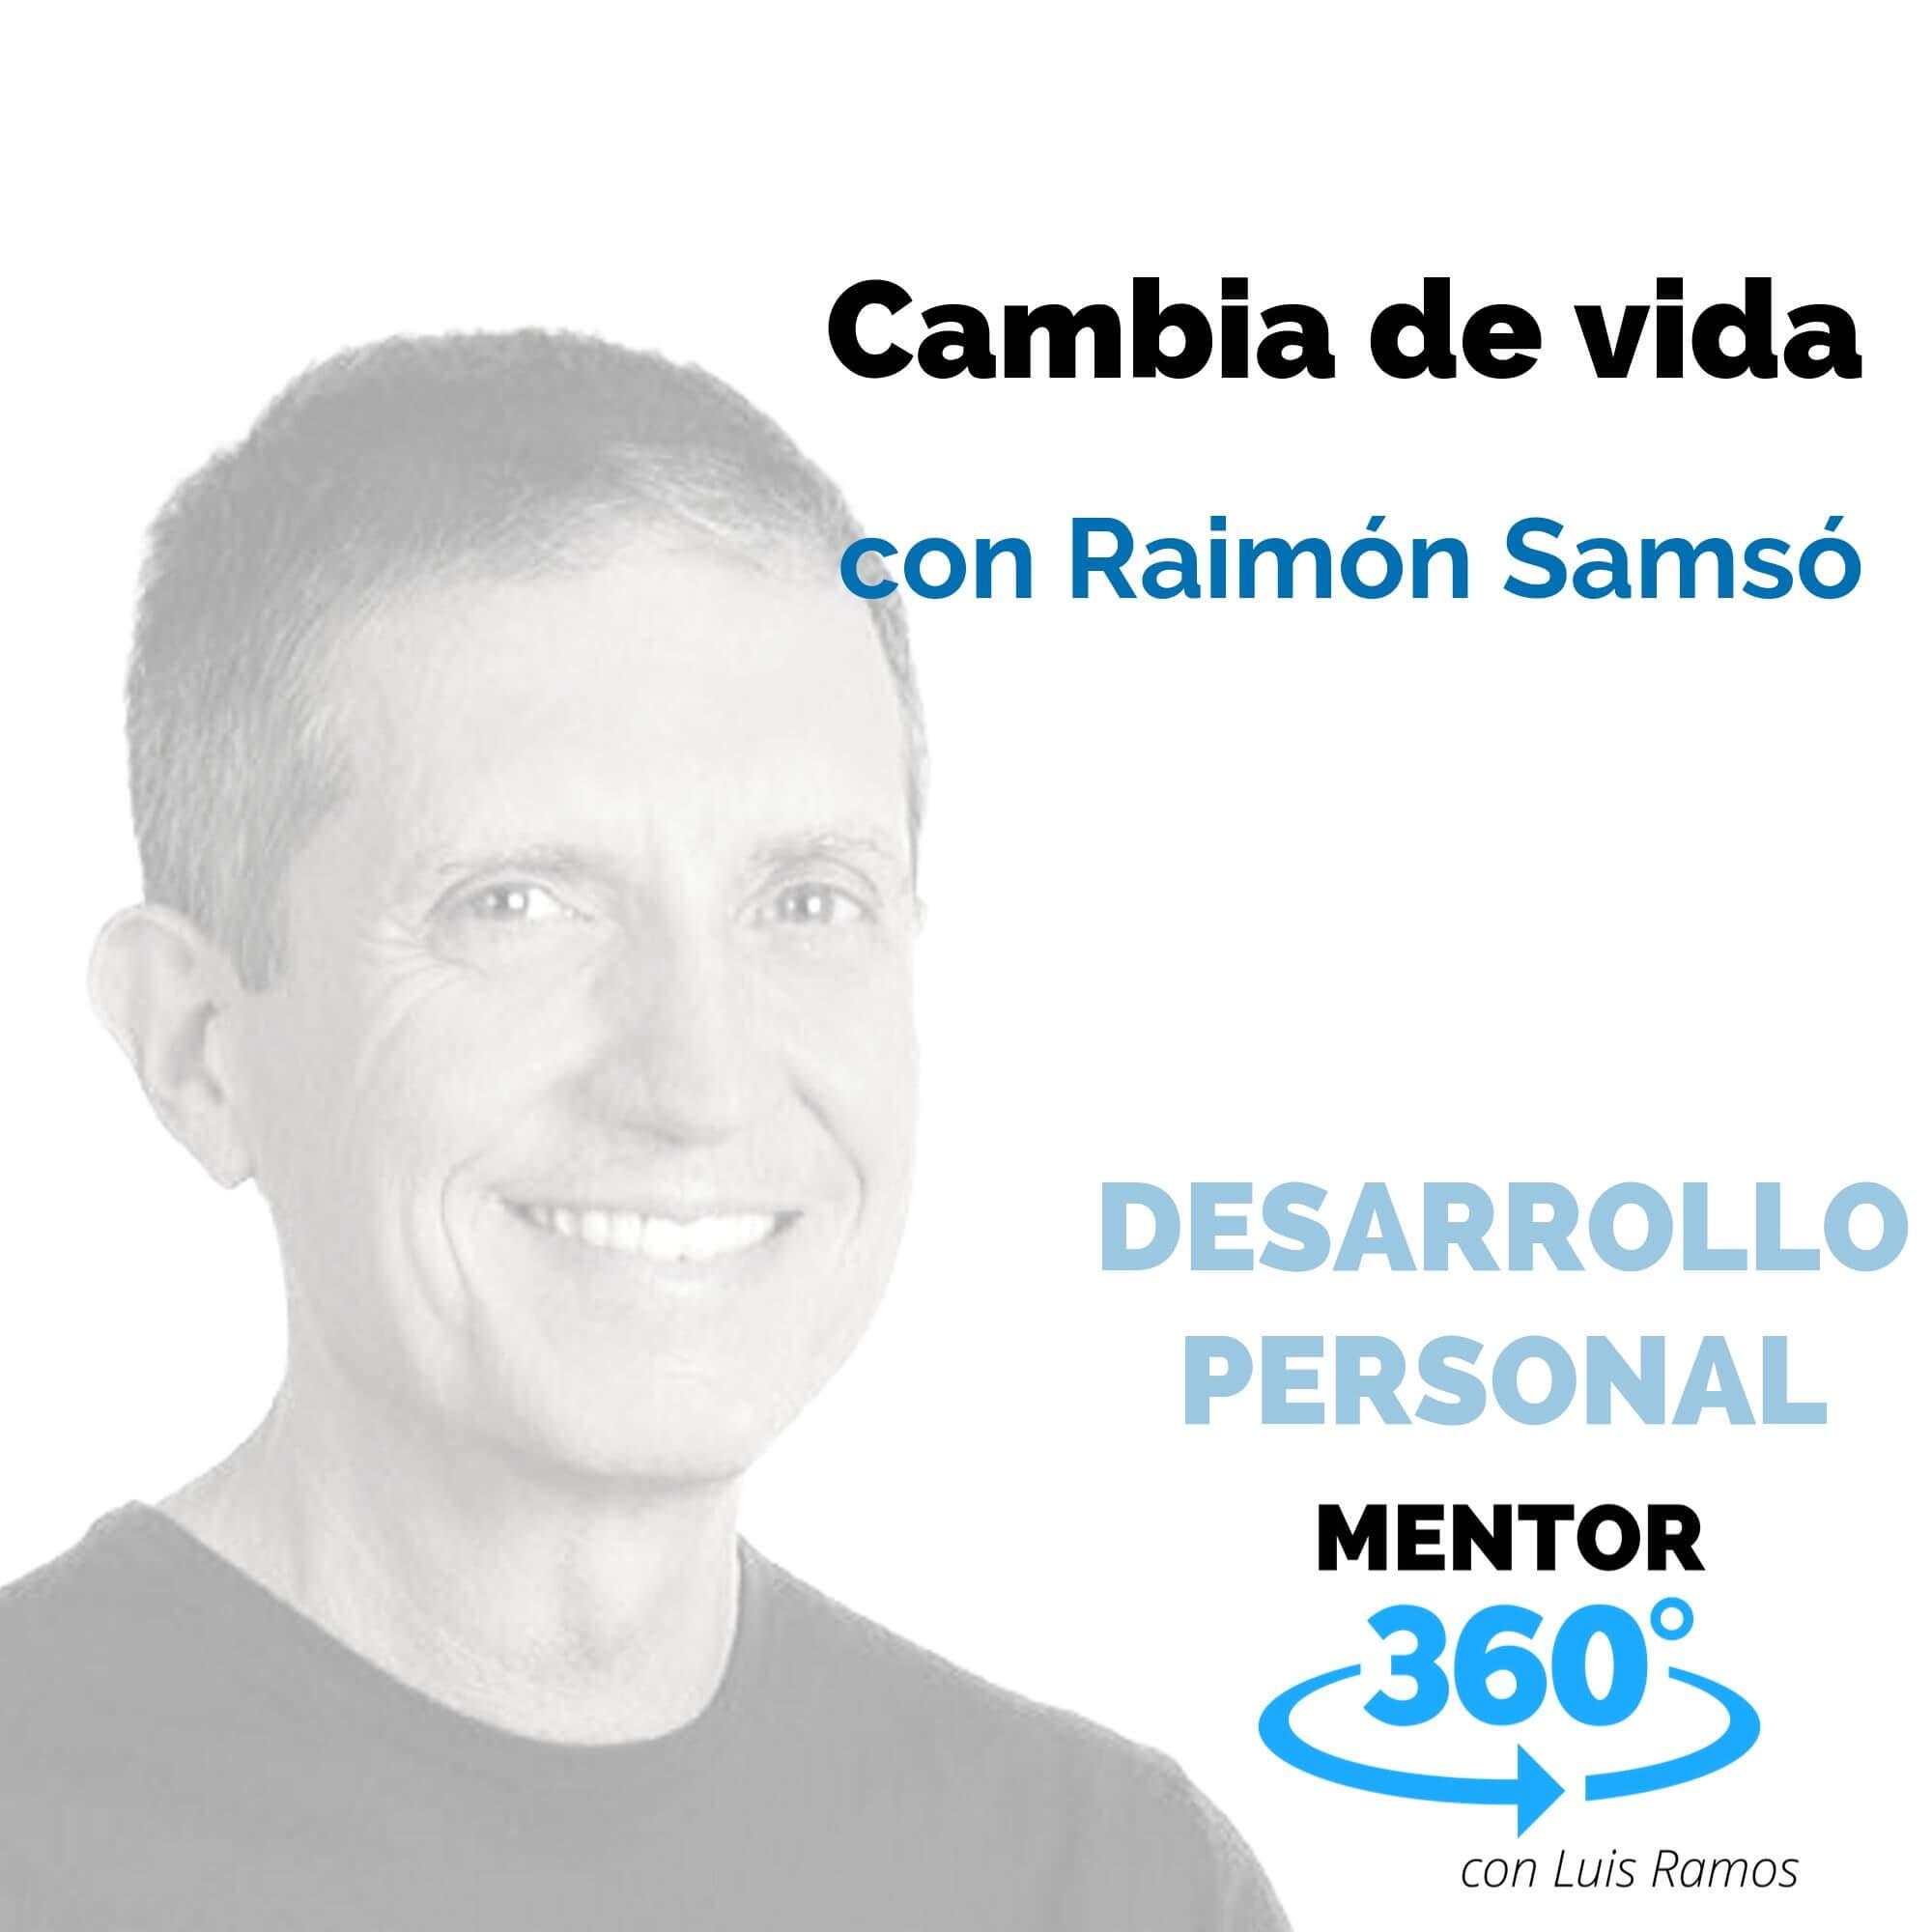 Cambia de vida, con Raimón Samsó - DESARROLLO PERSONAL